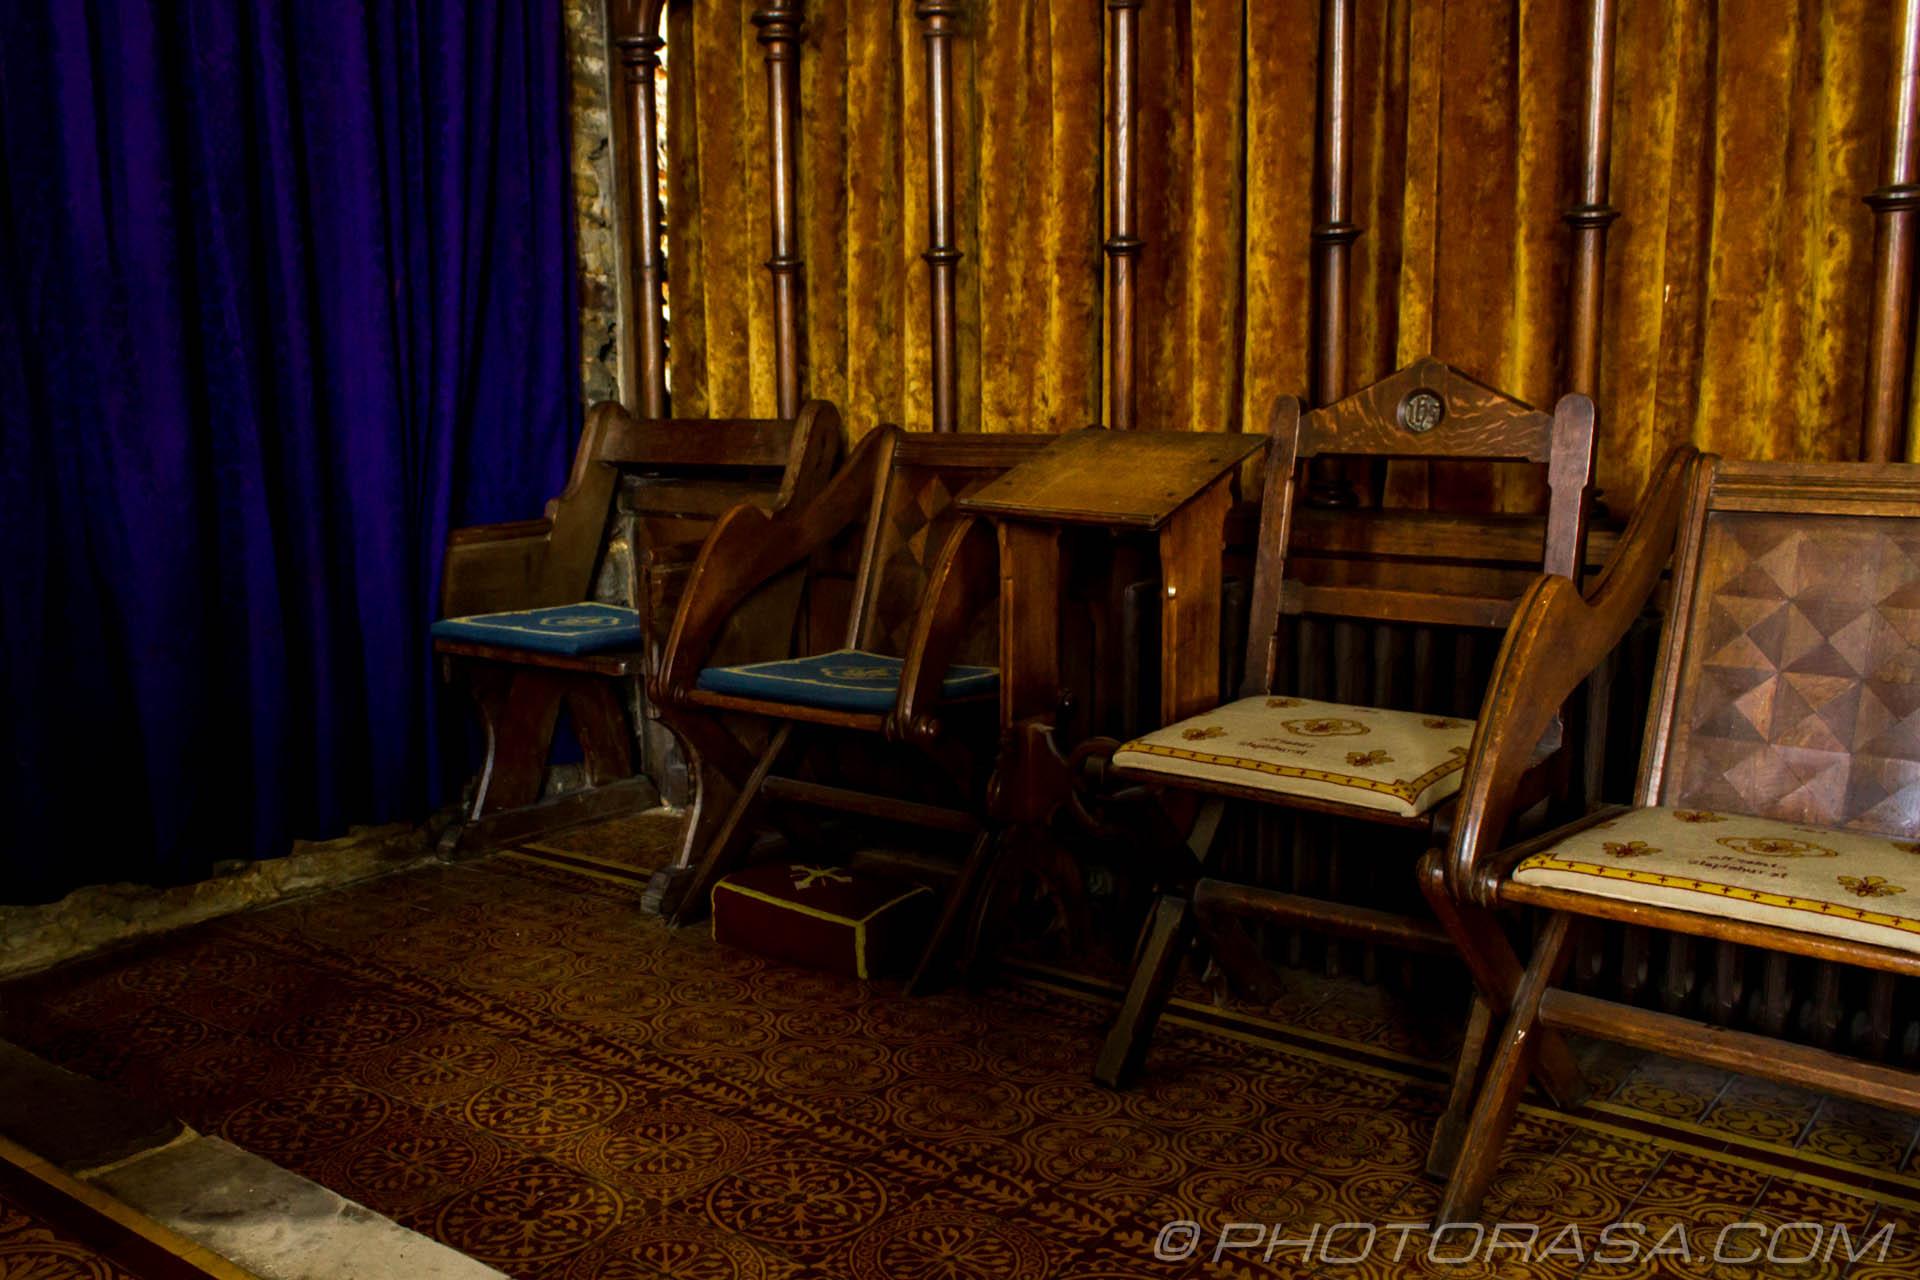 https://photorasa.com/saints-church-staplehurst-kent/chairs-and-purple-curtain/